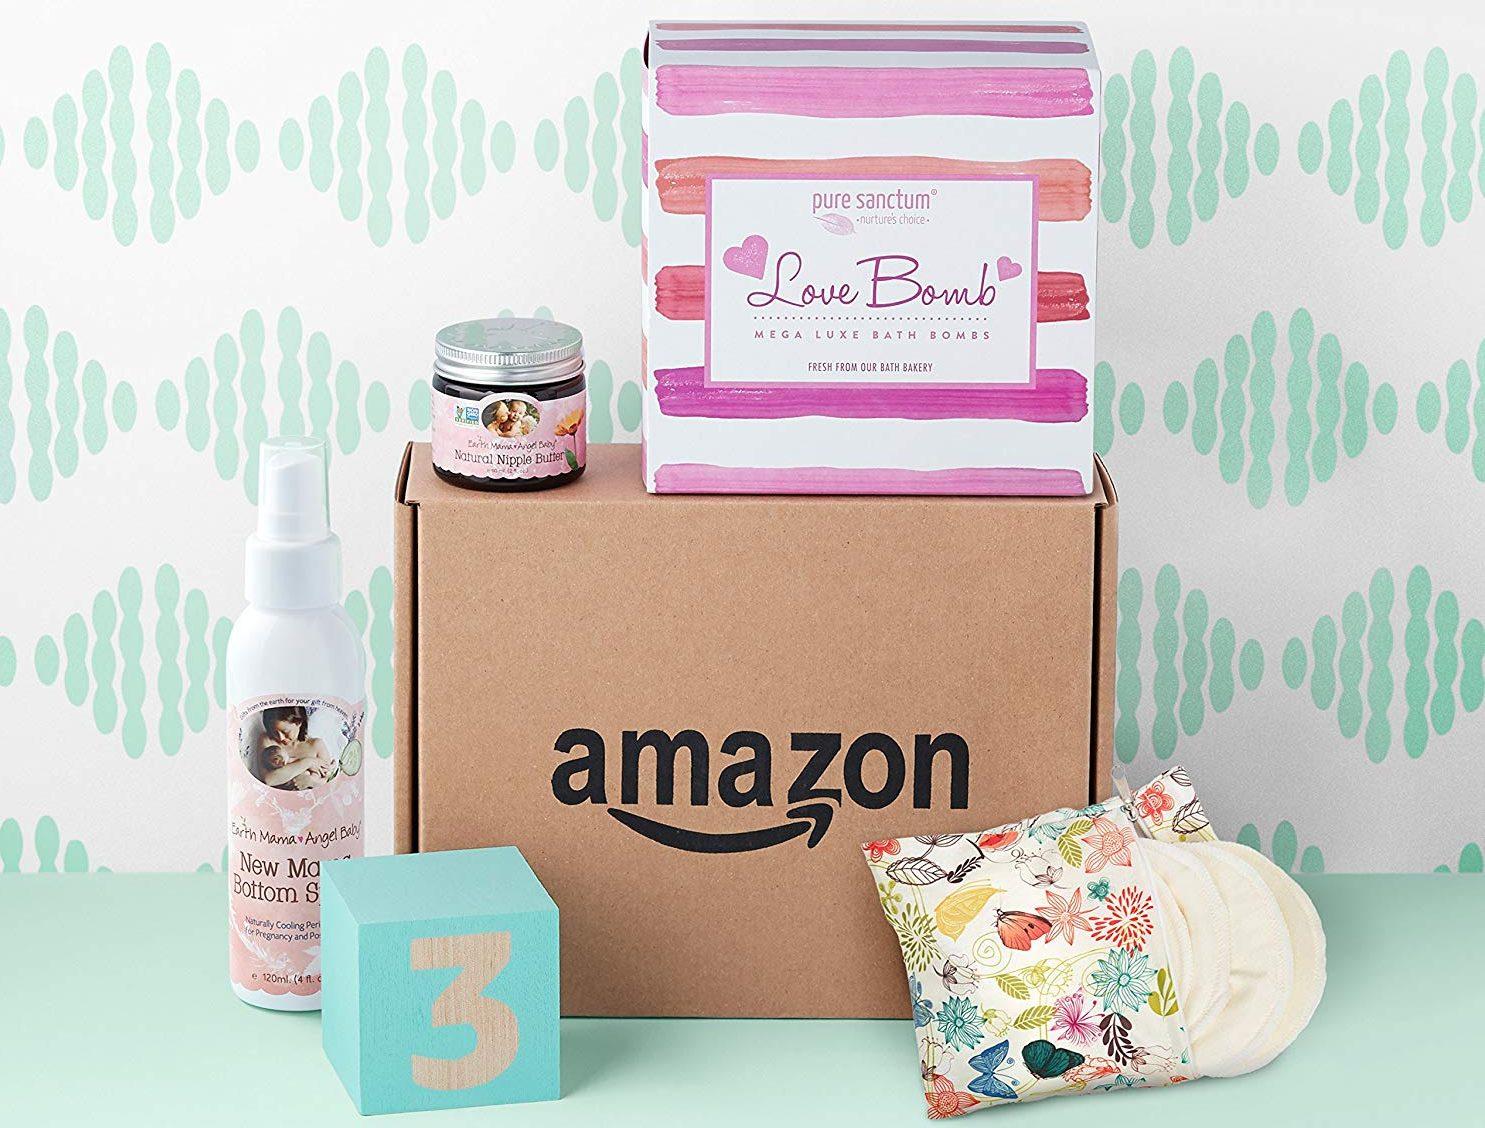 free Amazon Registry baby box – Amazon baby box 3rd trimester